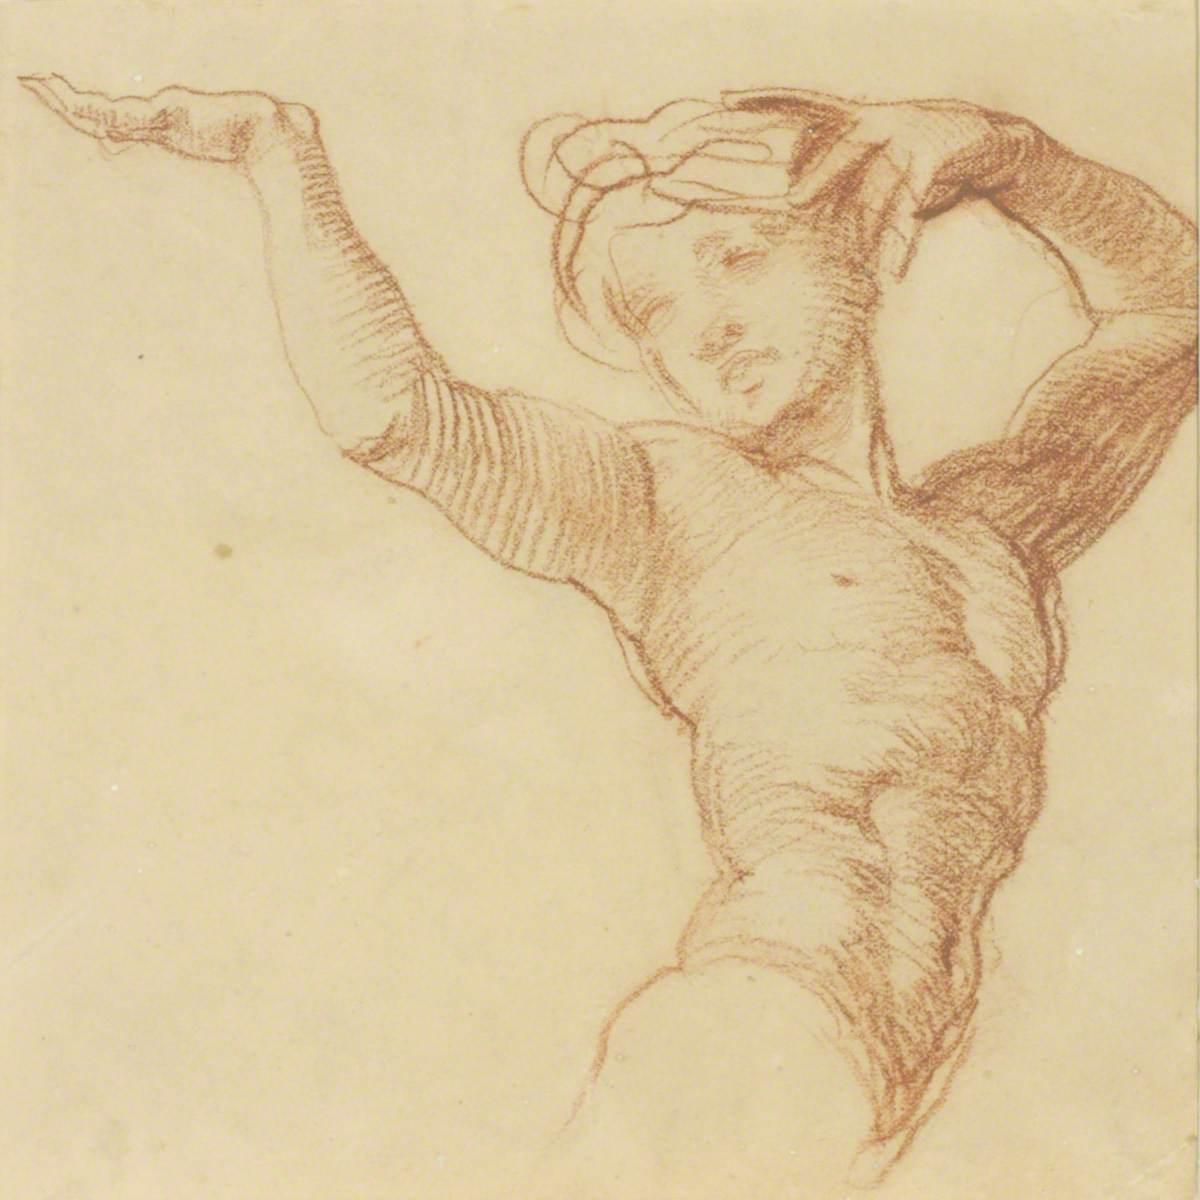 Study of a Nude Figure